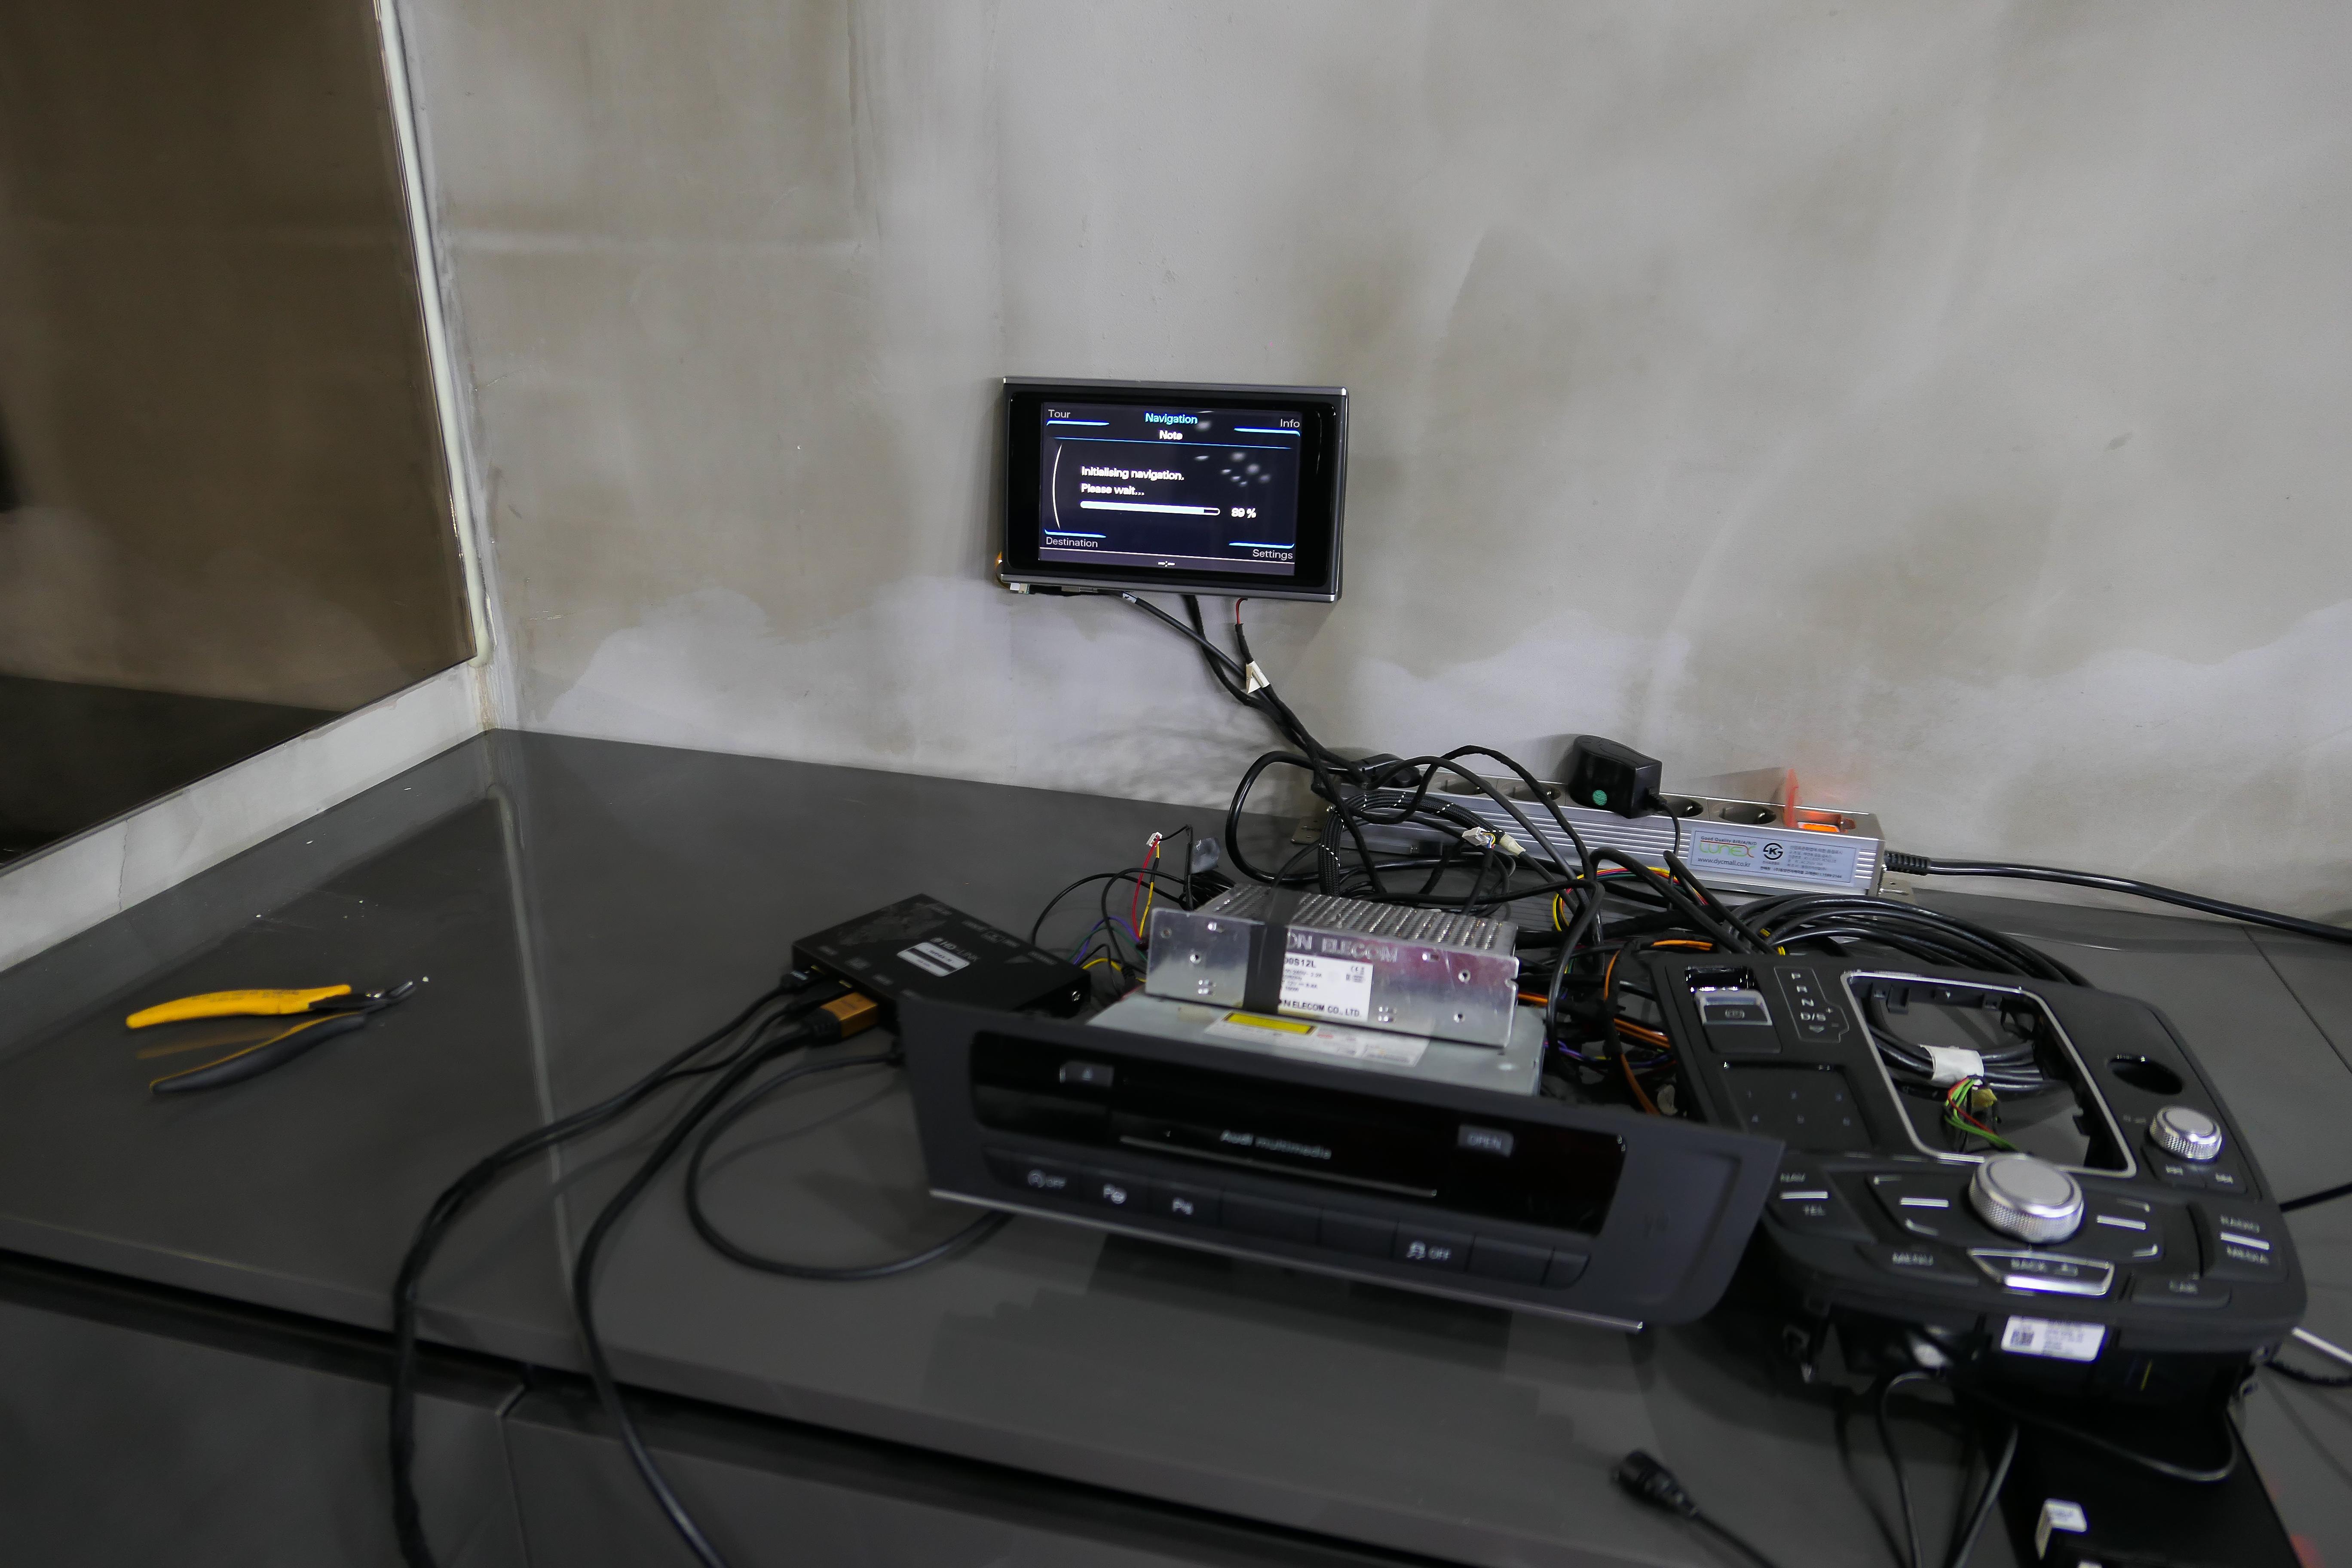 AUDI(3G MMI),BMW(NBT)Apple Car play,Android auto | INDIWORK